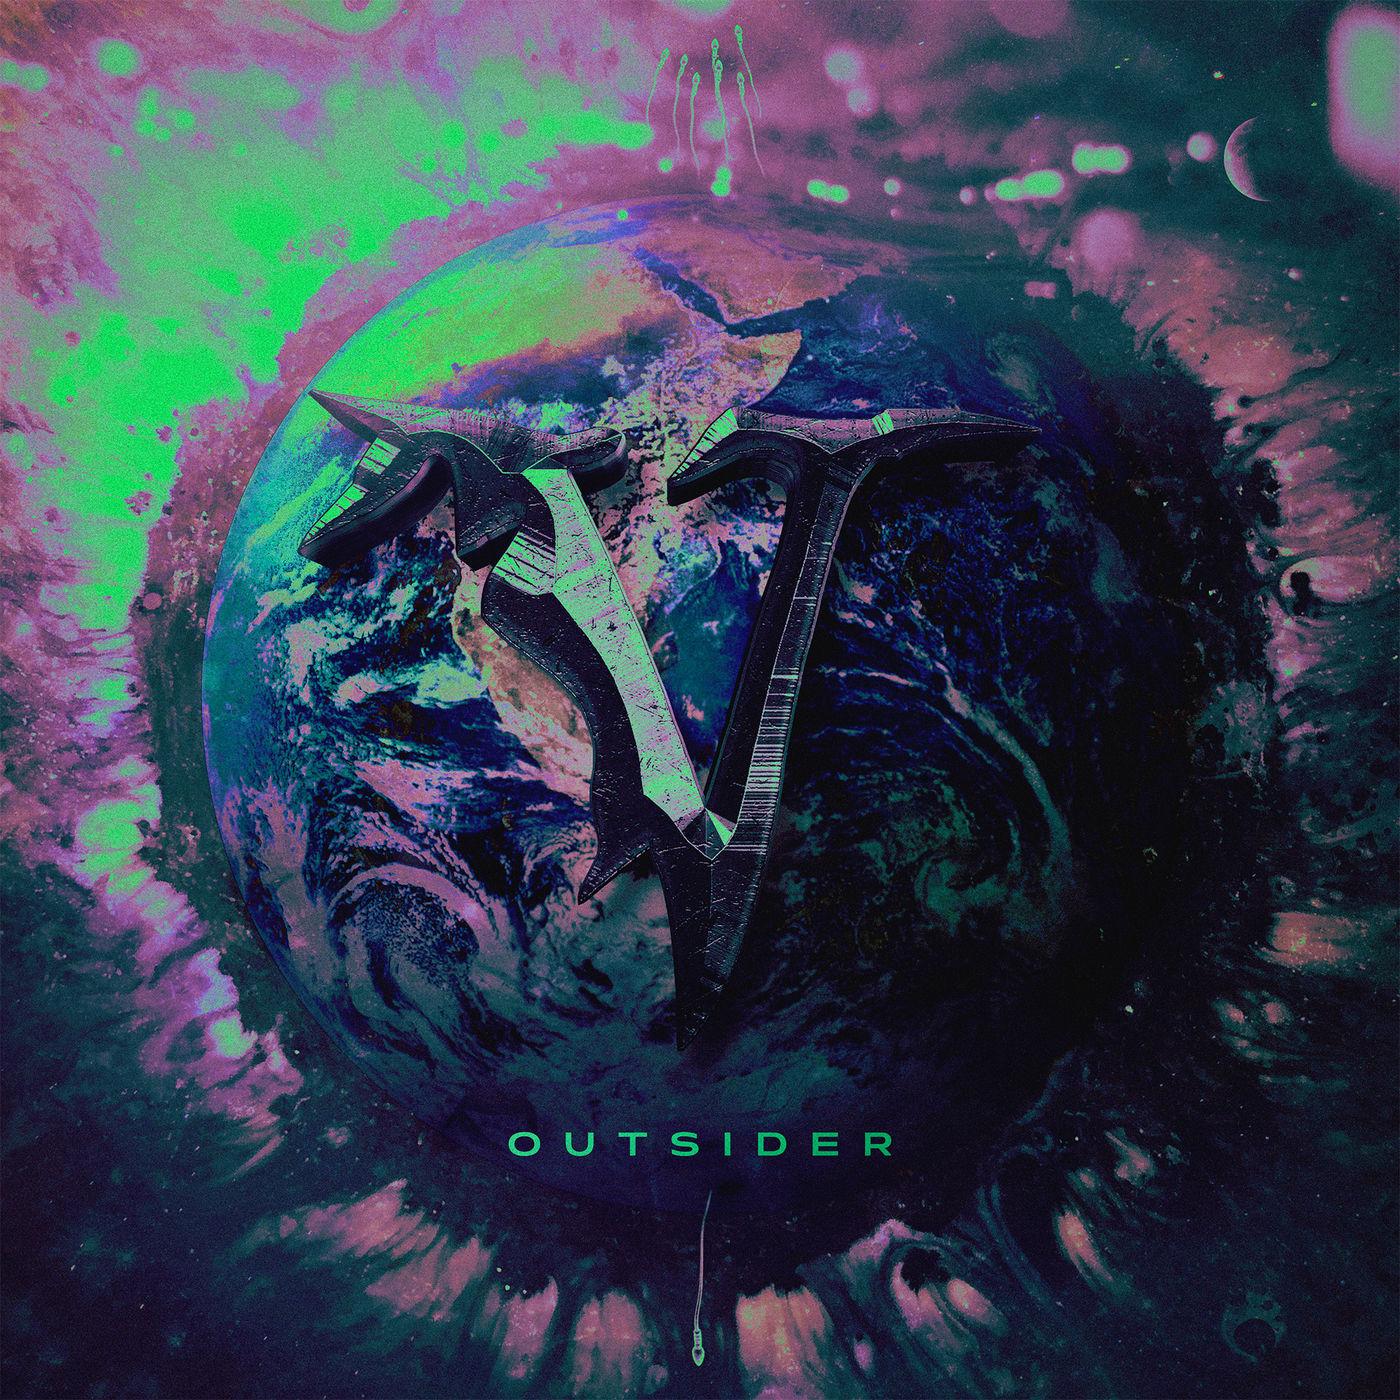 Veil of Maya - Outsider [single] (2020)